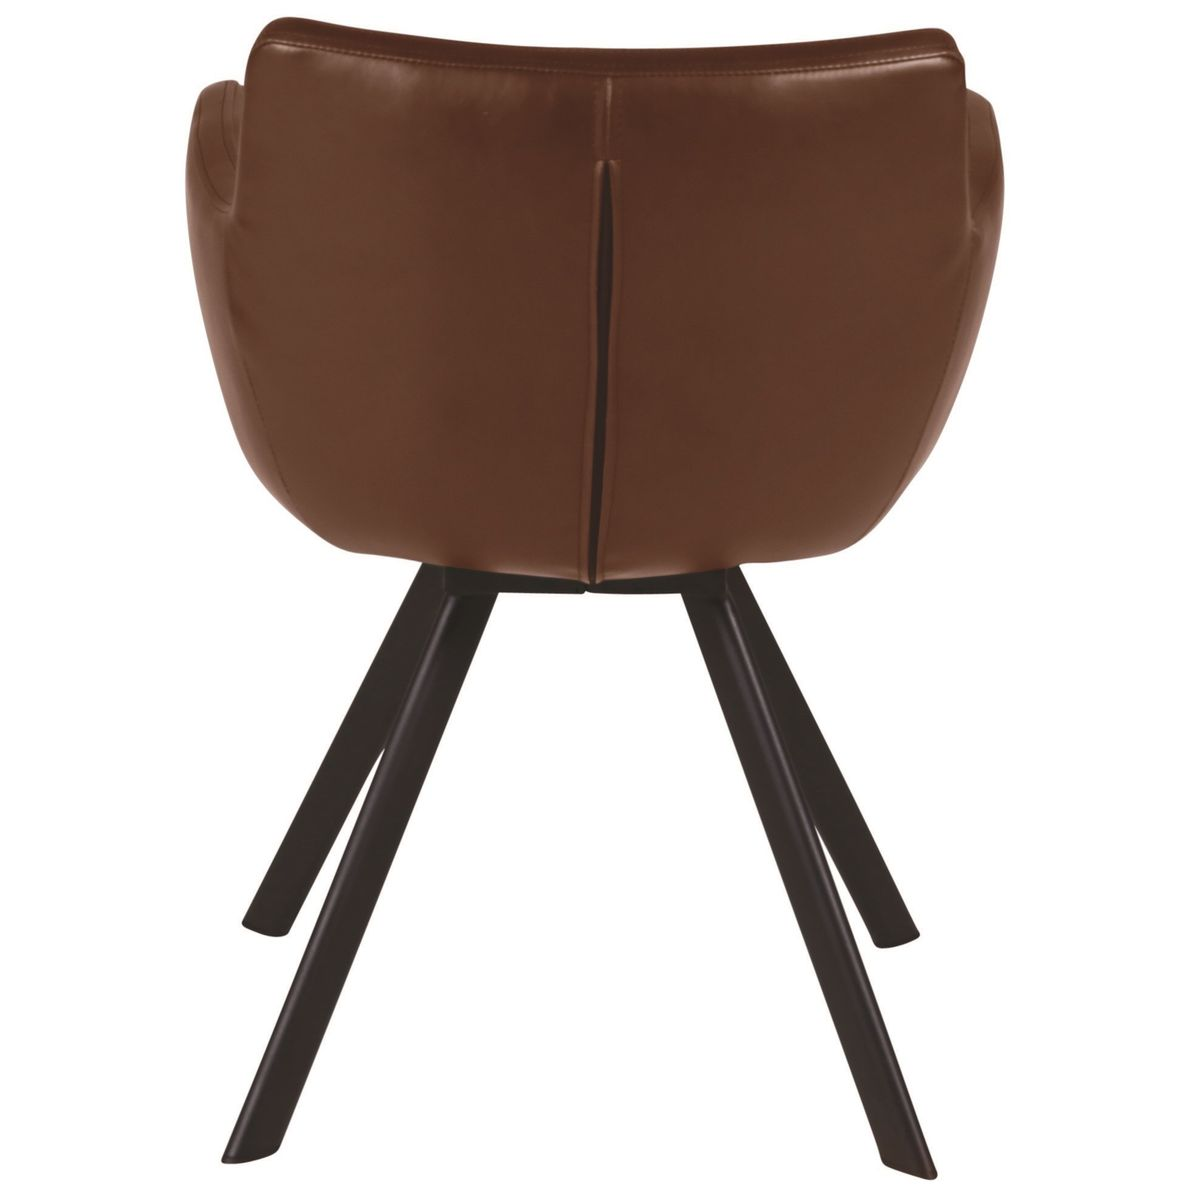 Chaise accoudoirs imitation cuir marron et pieds métal